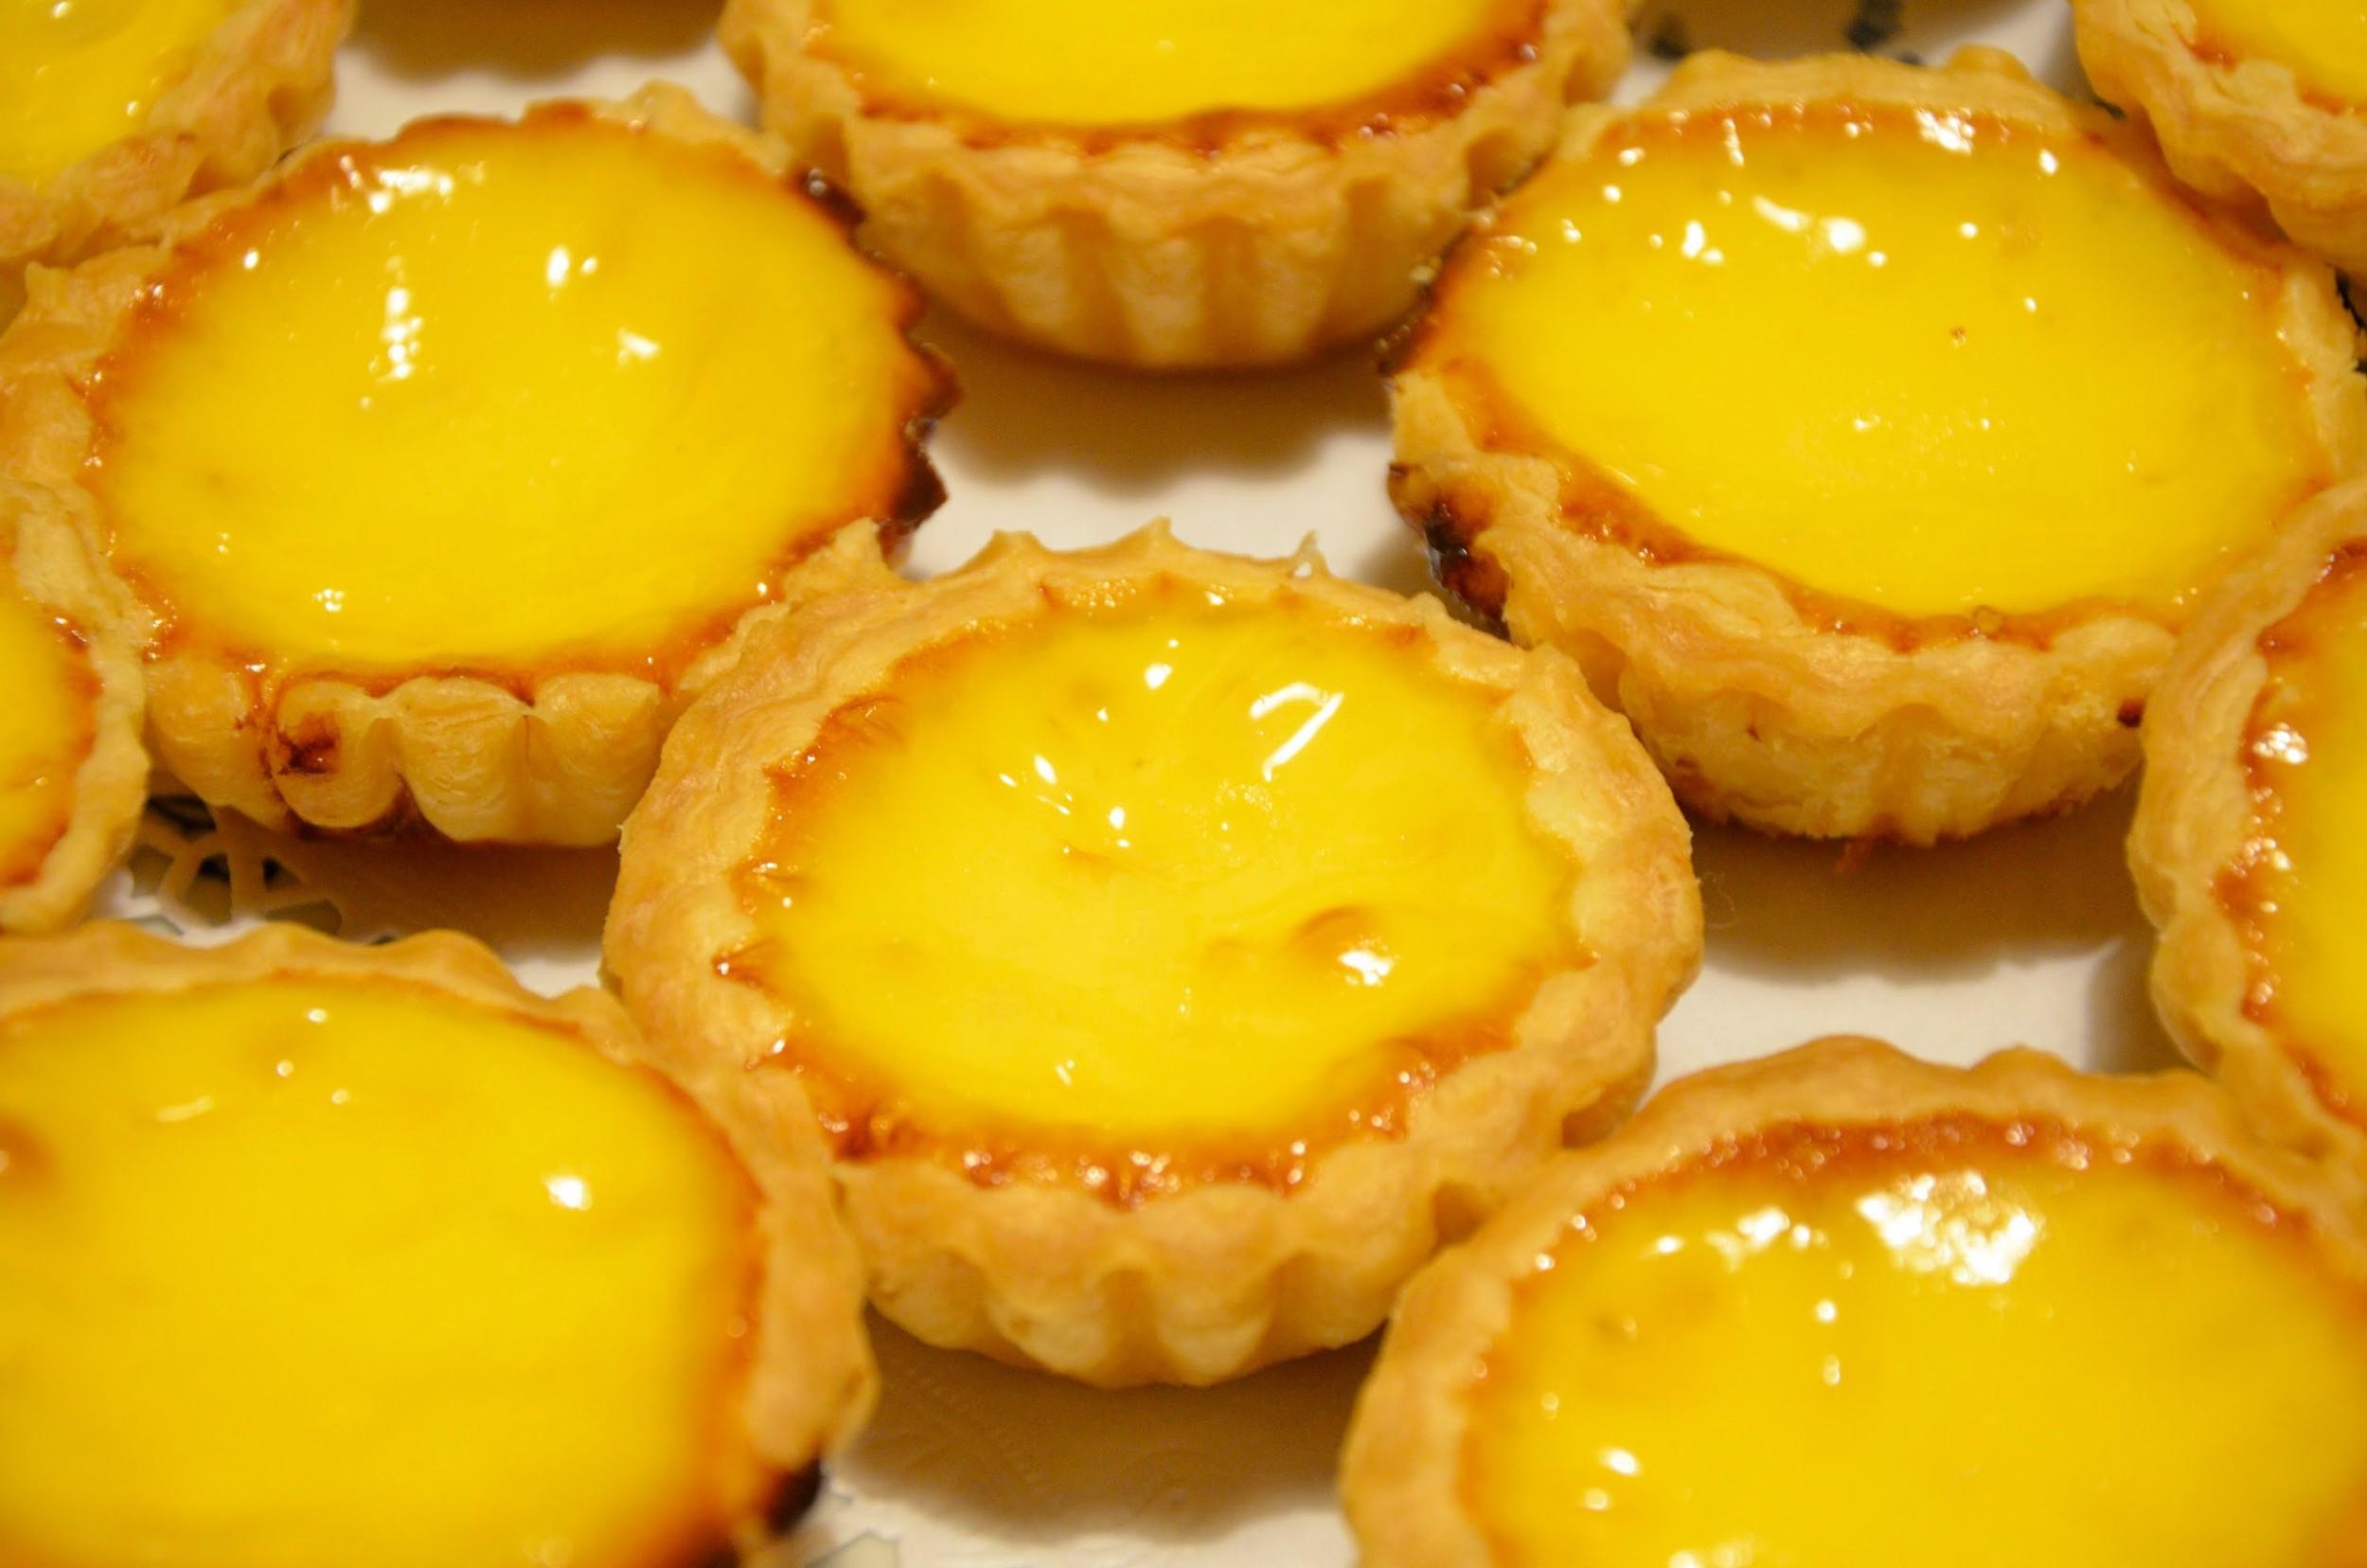 Foodable WebTV Network |  Pictured: Hong Kong-style egg tart  | Photo Credit: YouTube